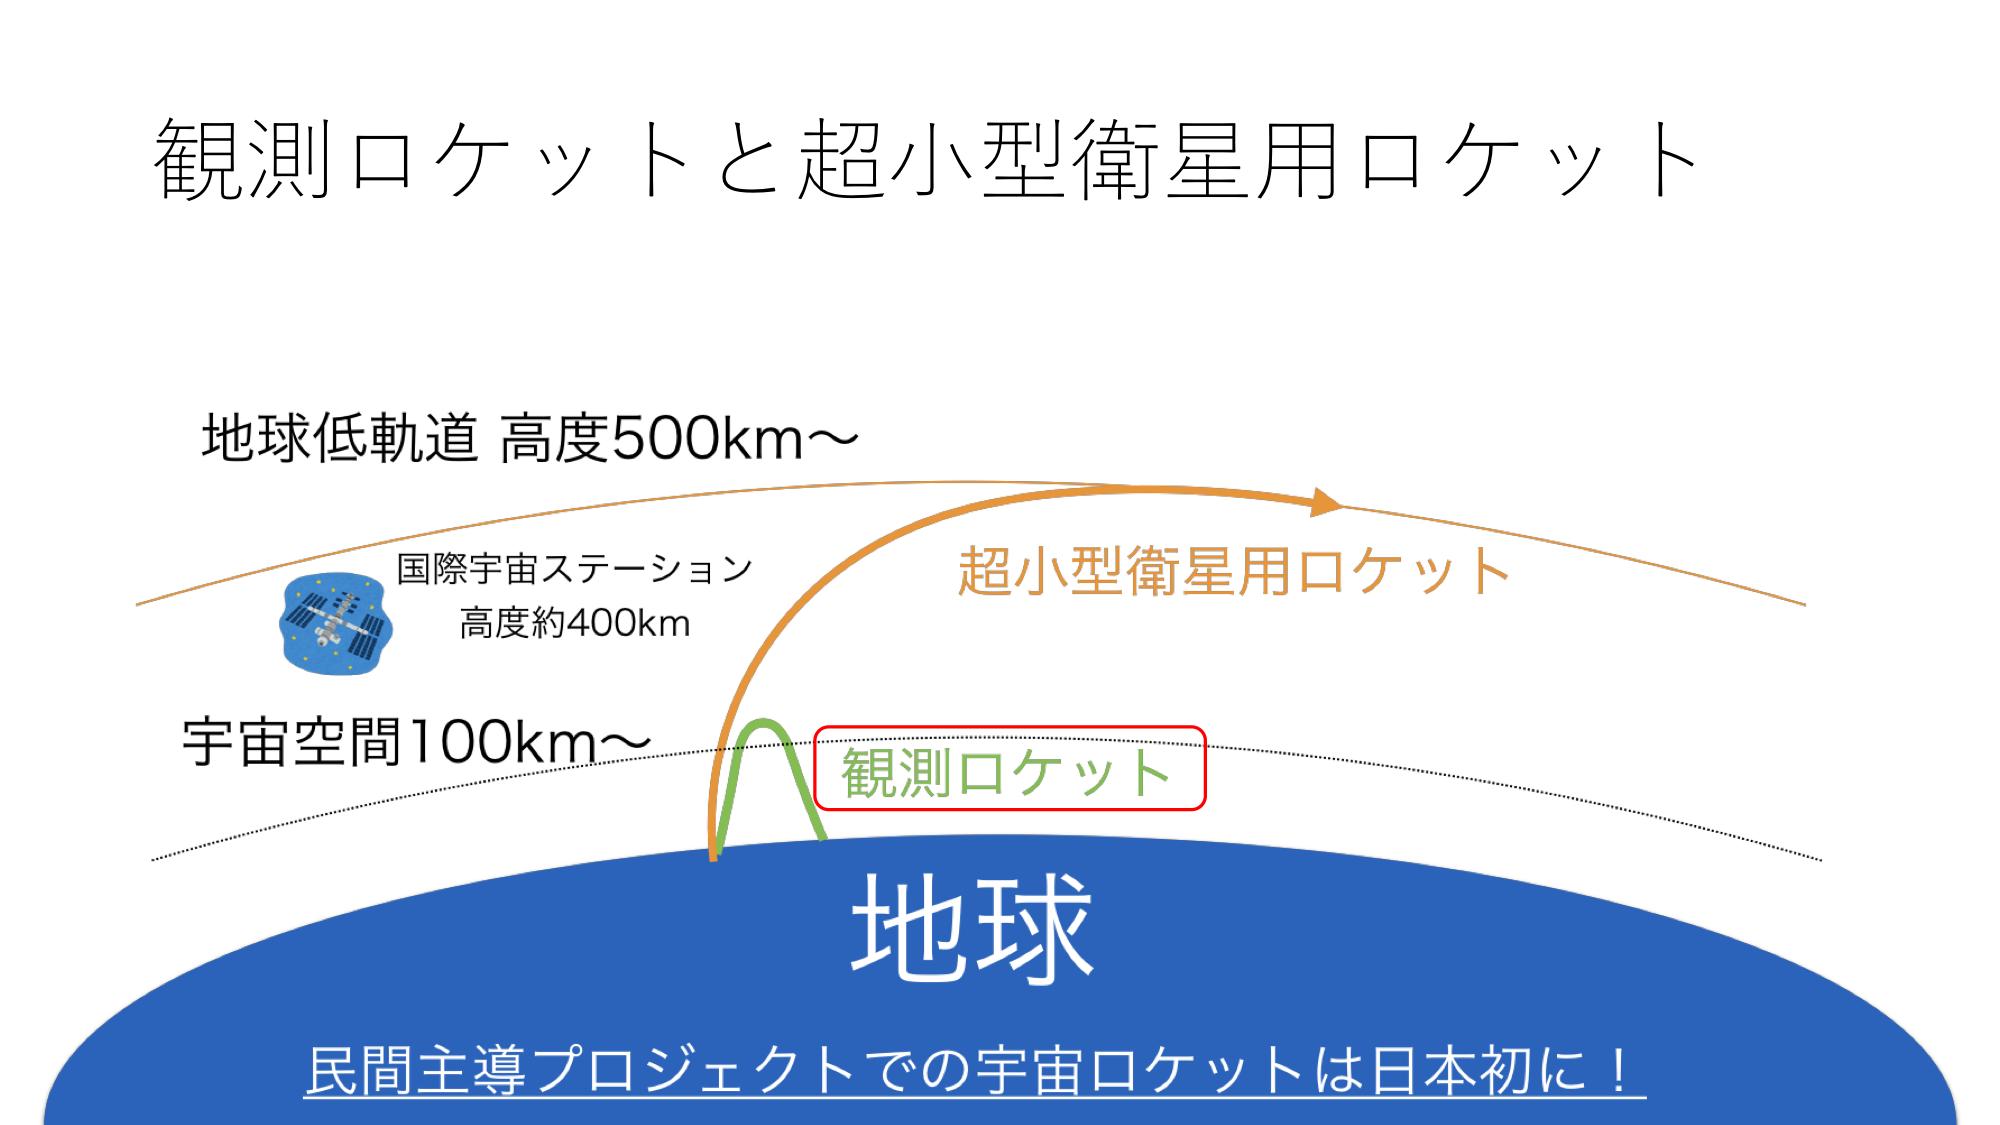 f:id:Imamura:20190414213950p:plain